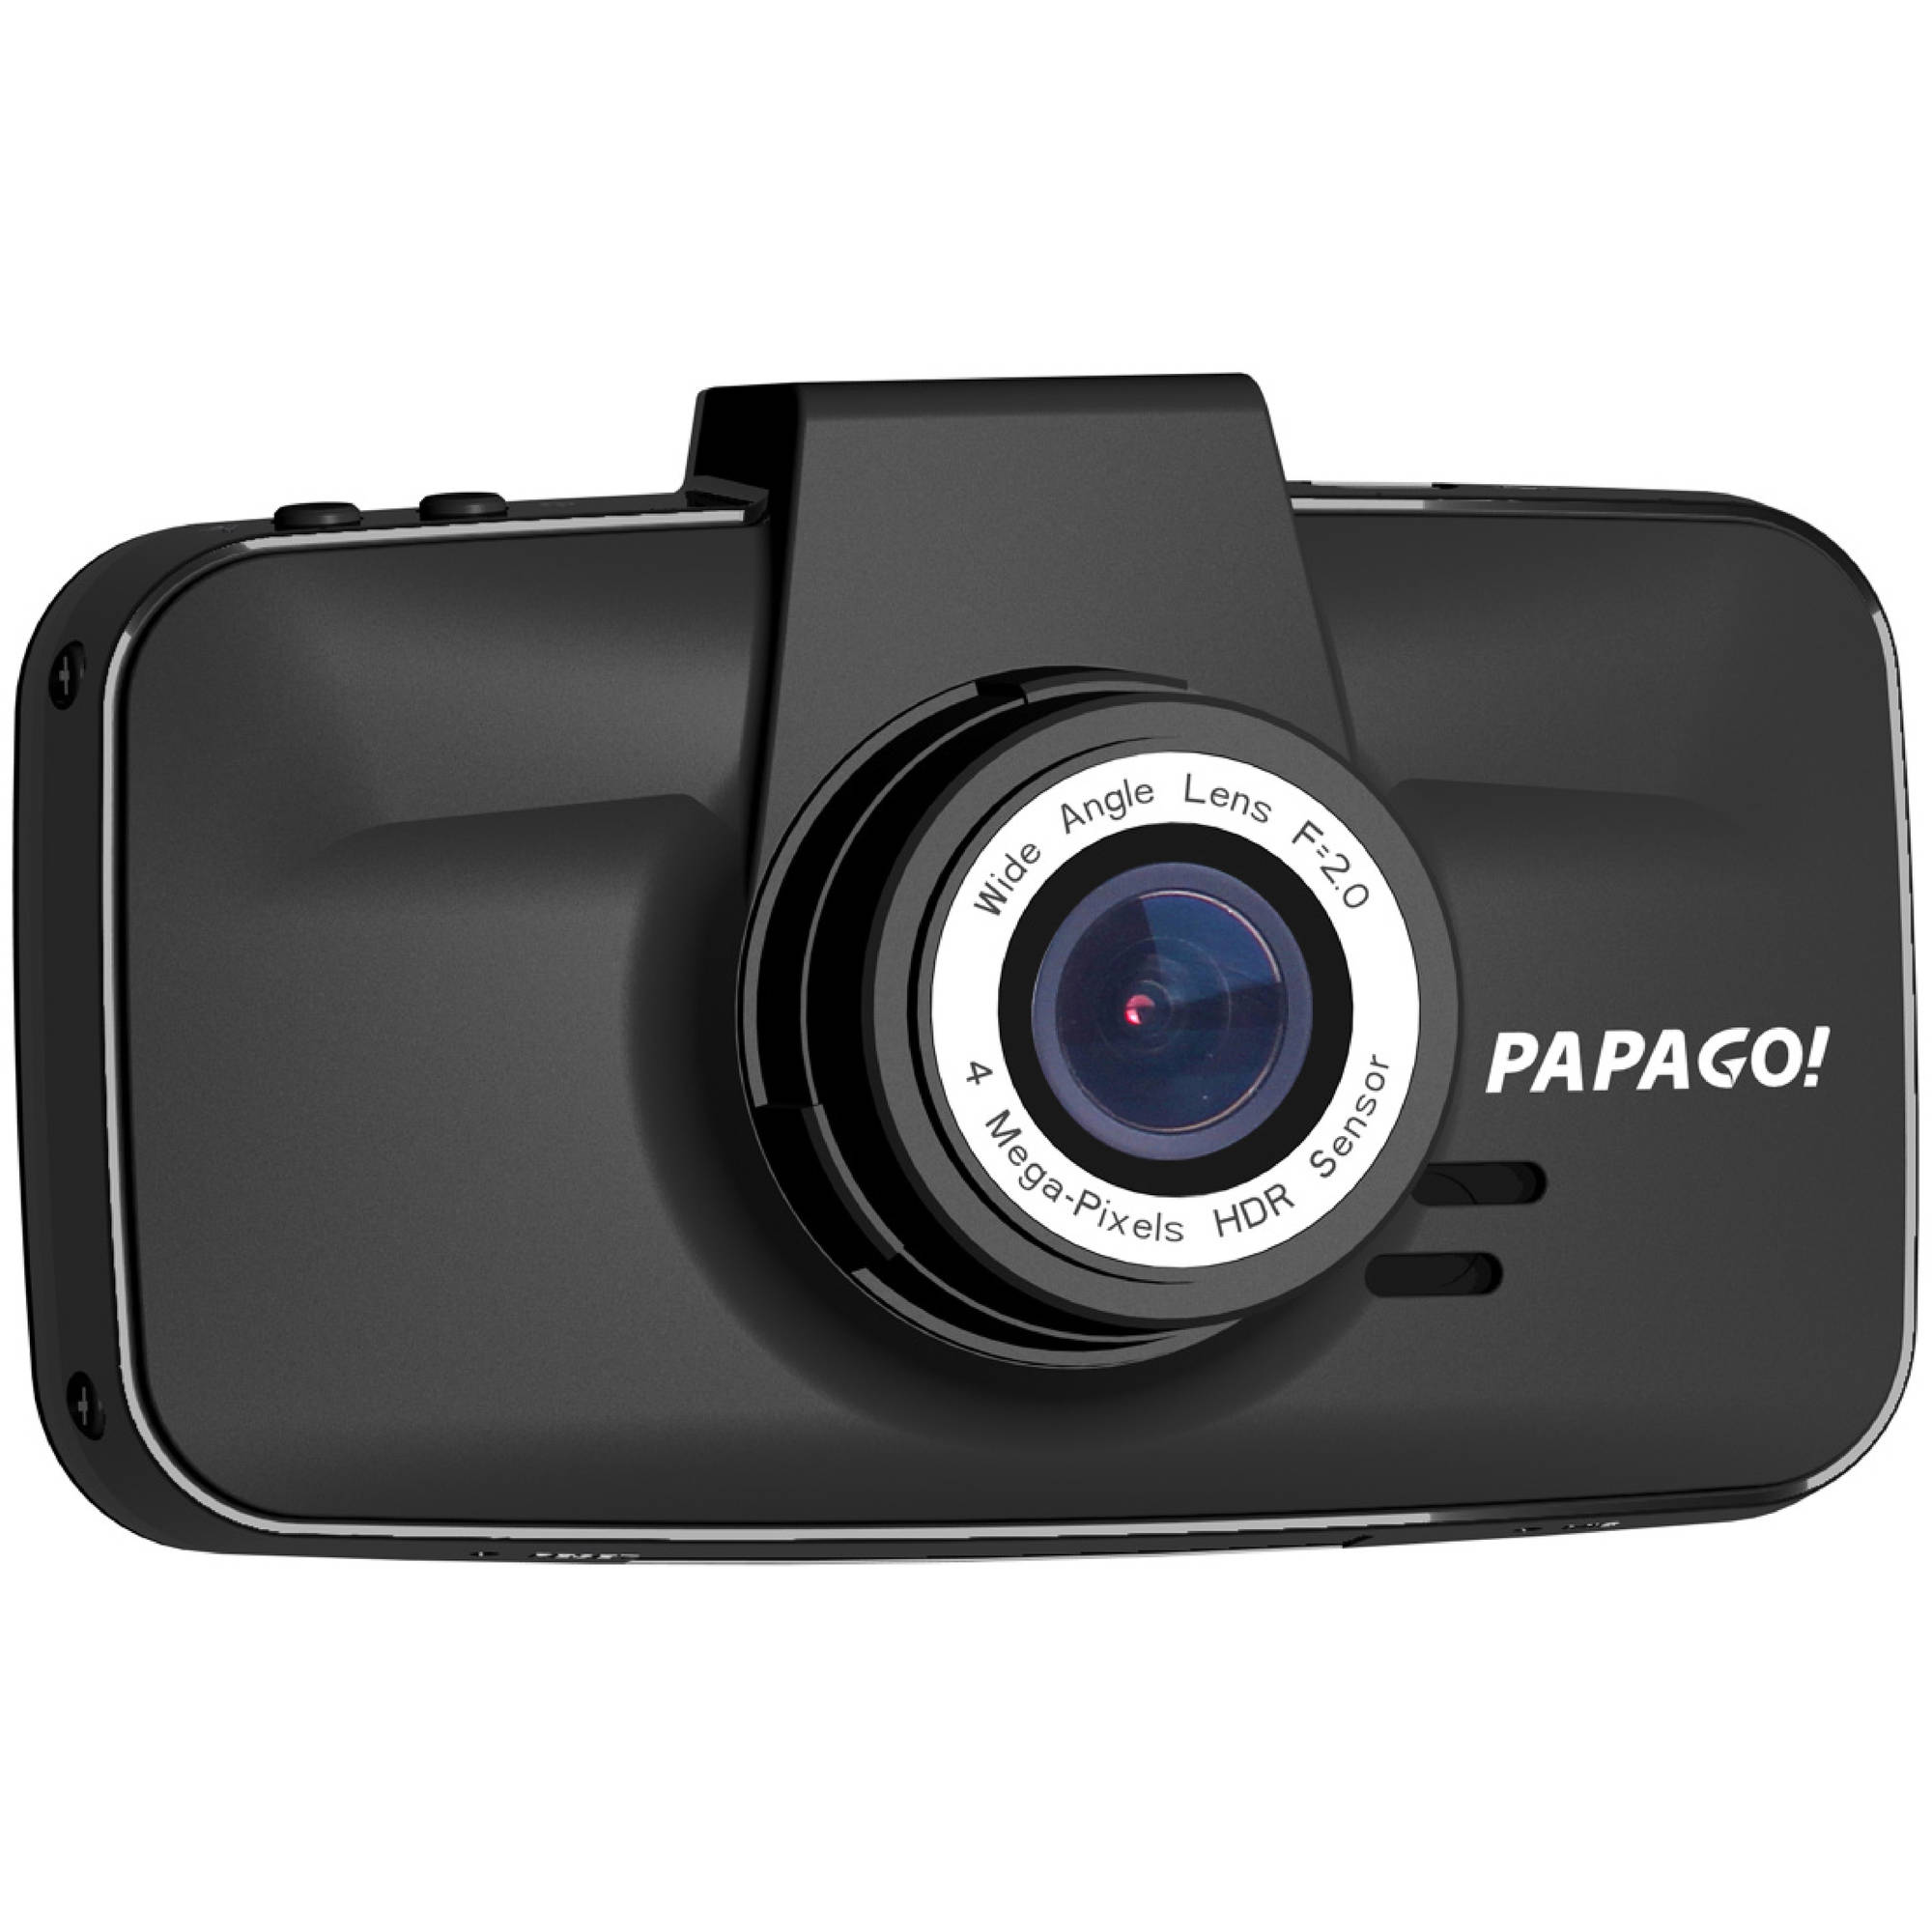 PAPAGO GoSafe 520 Super HD 2304x1296 Dash Cam Car DVR Dashboard Camera Video Recorder with Suction Mount, Superior Night Vision, Parking Monitor, G-Sensor, Black